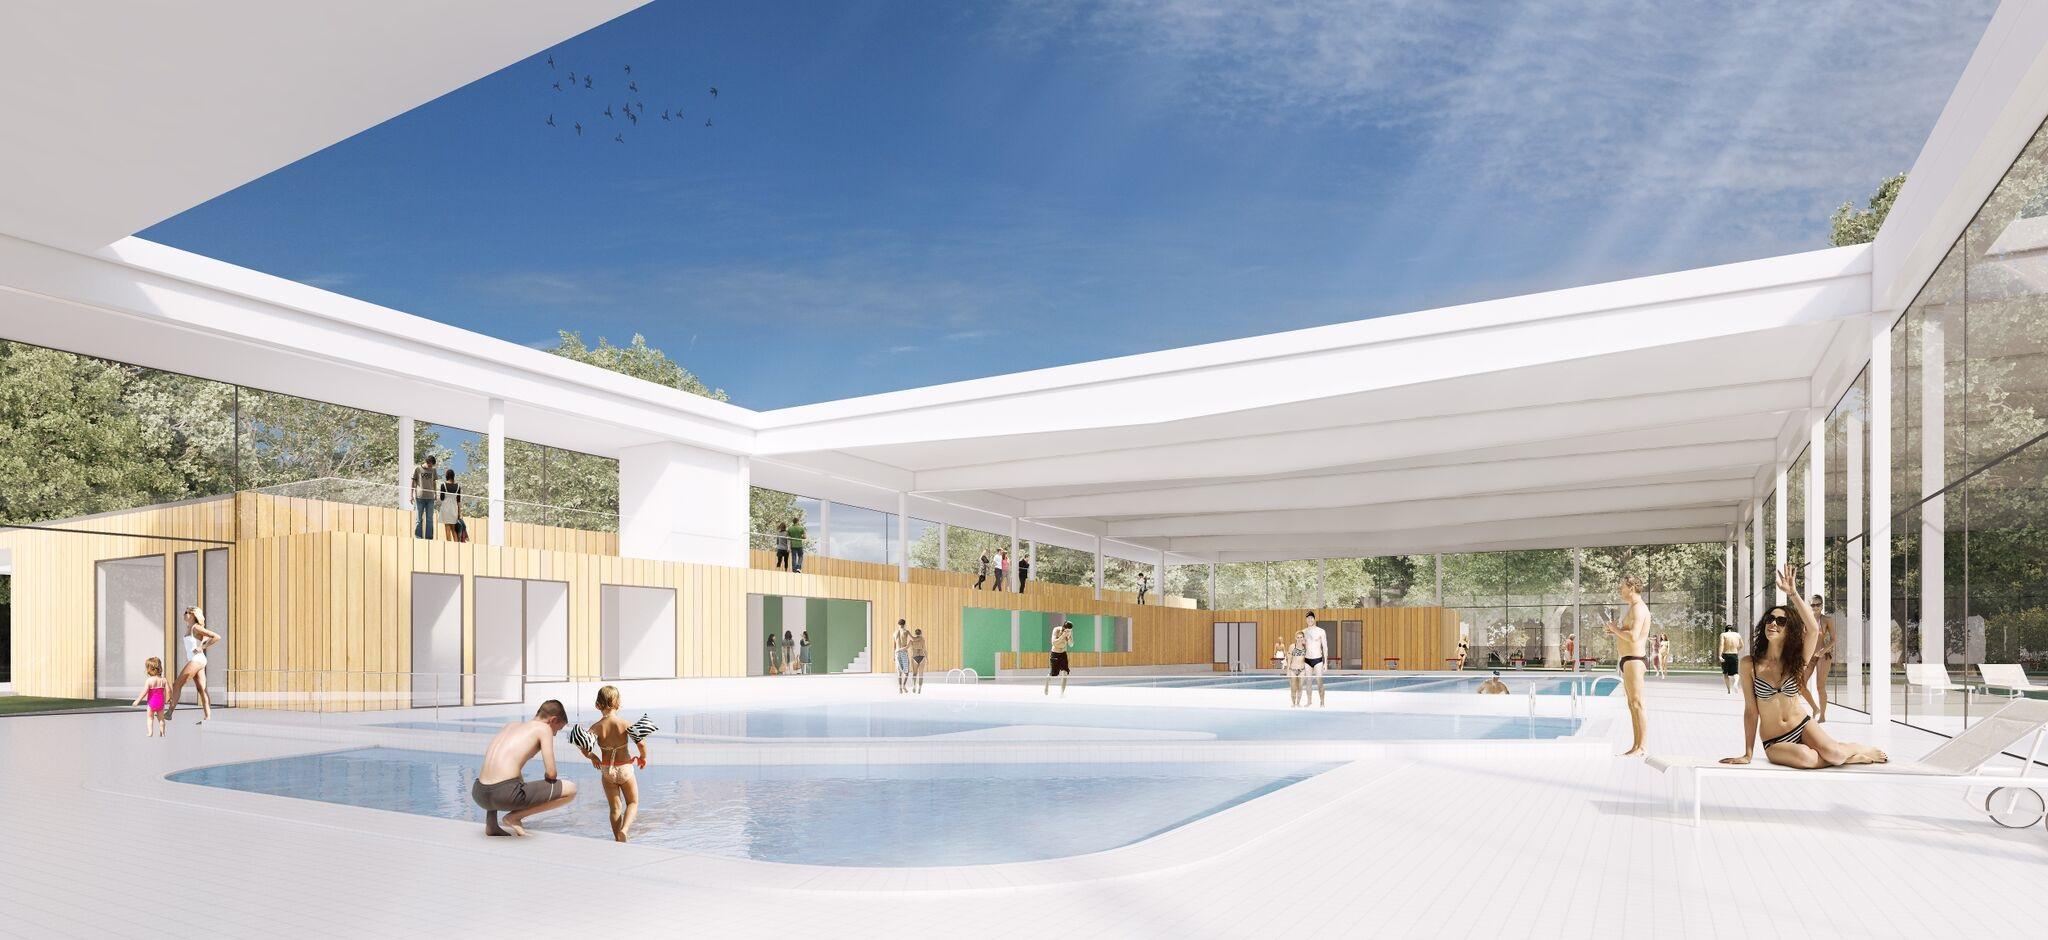 La piscine du Pinsan Eysines